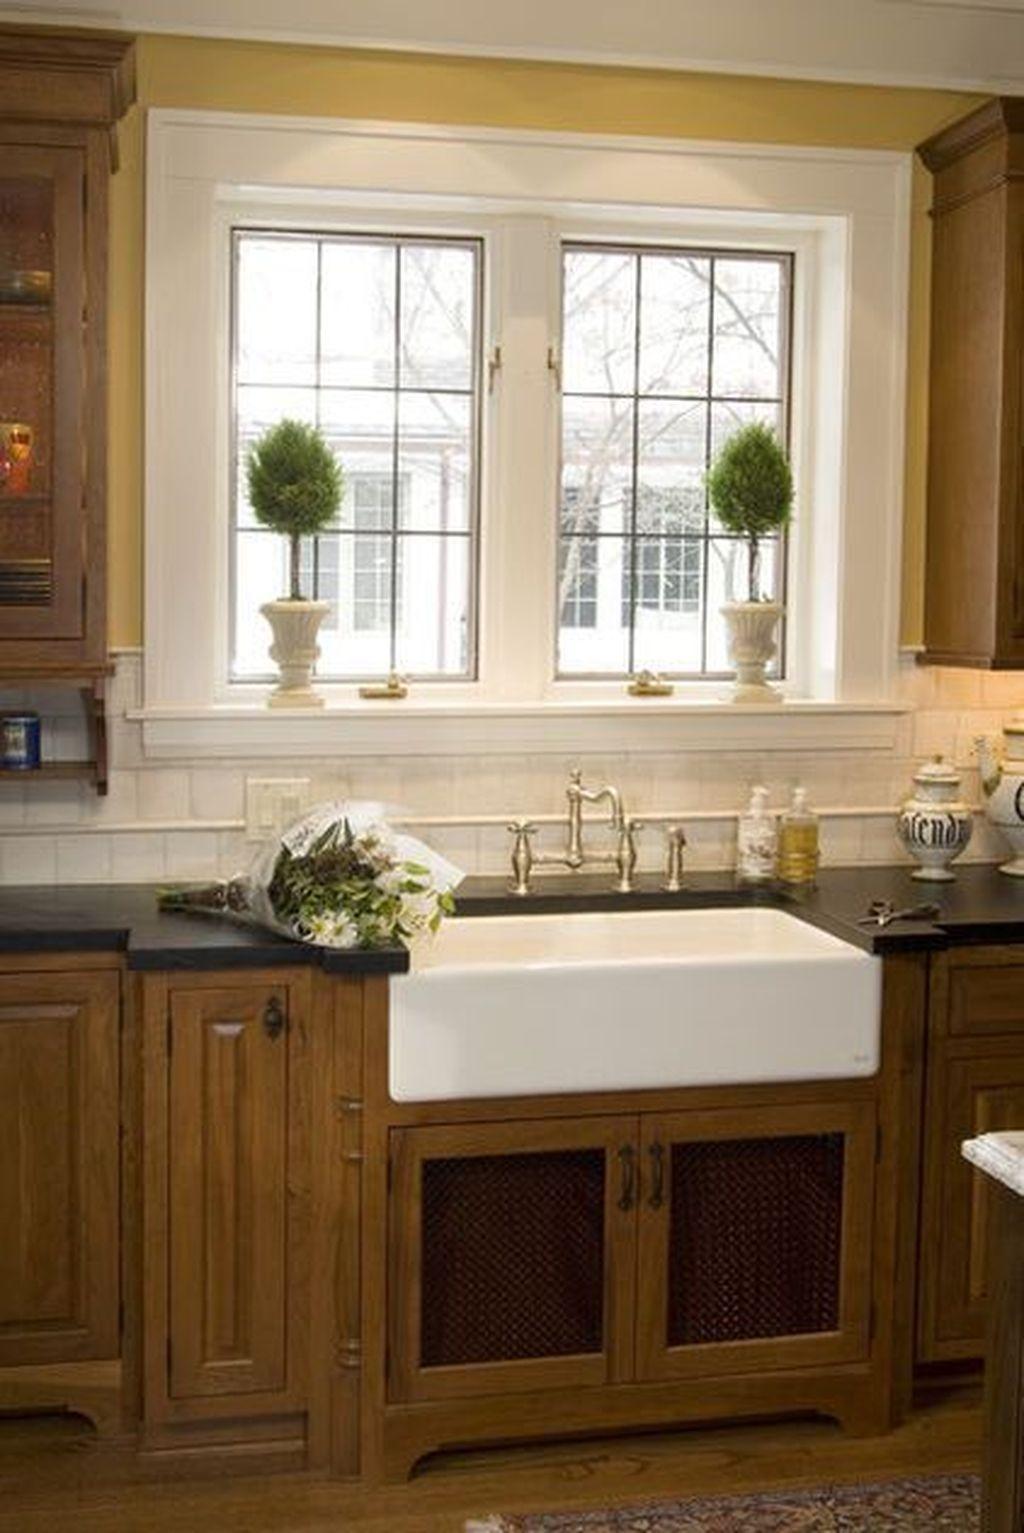 20+ Modern Rustic Window Trim Inspirations Ideas Kitchen